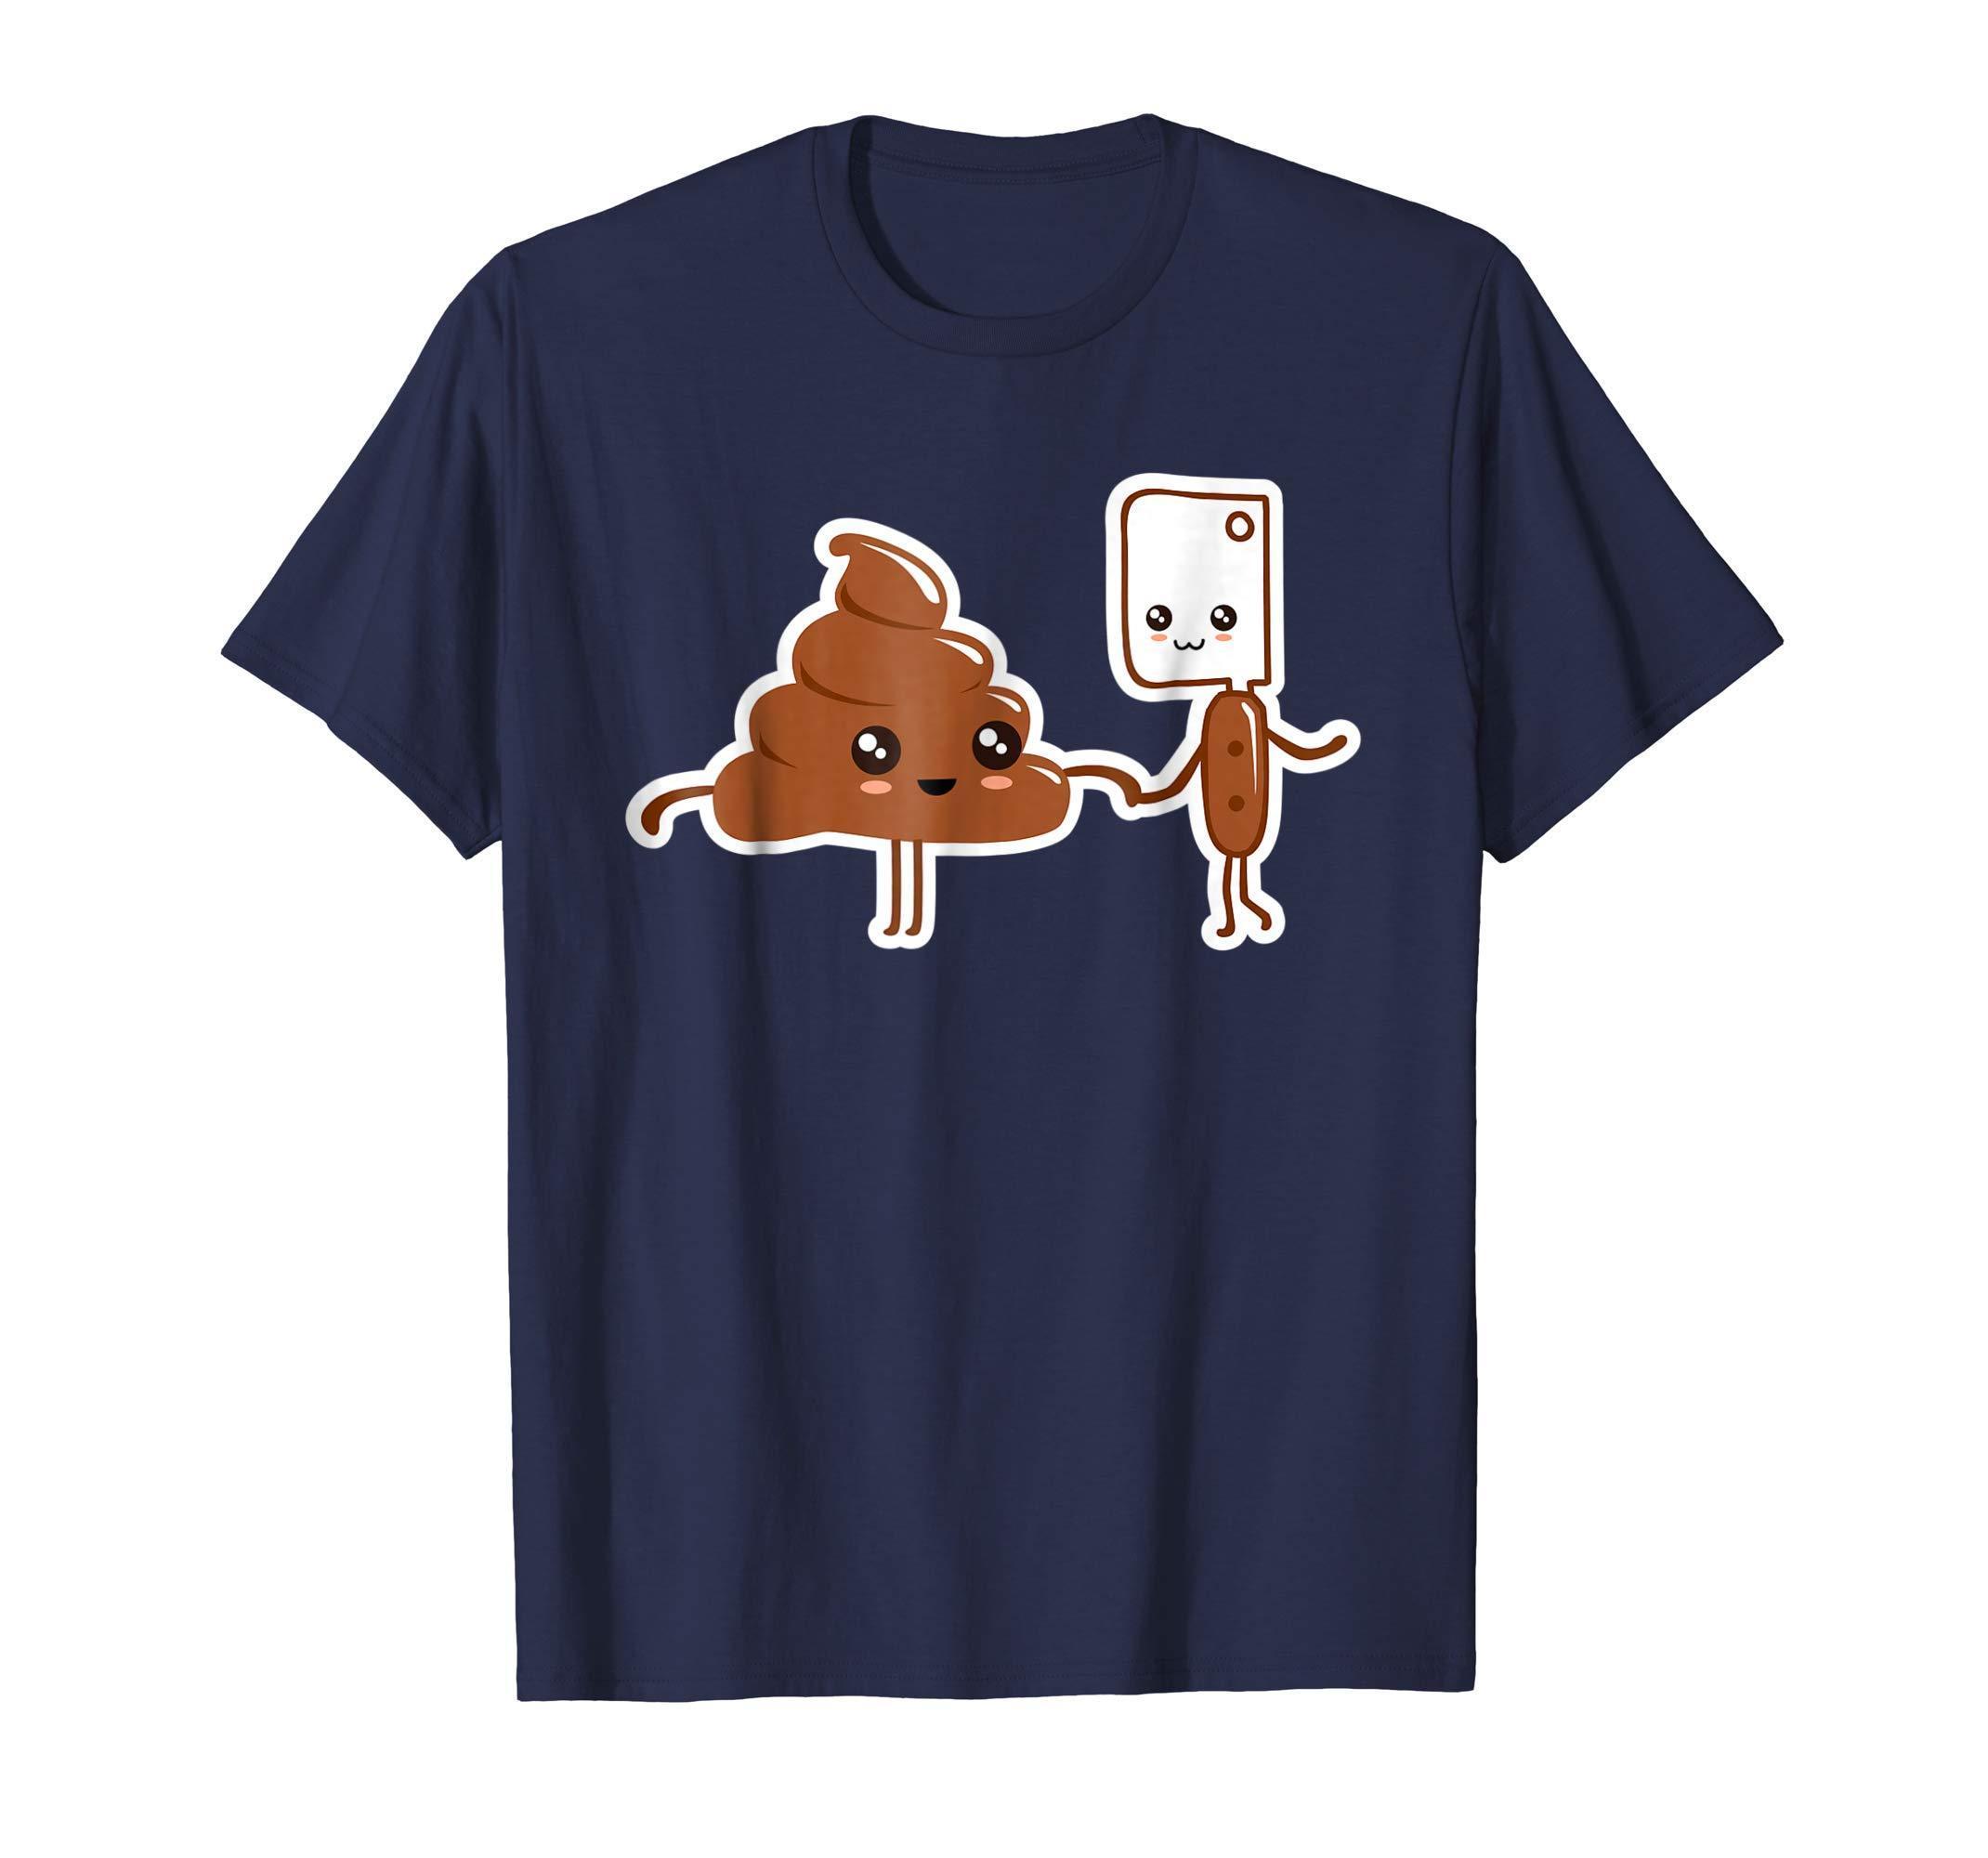 Buy Poop Knife Ts Shirts